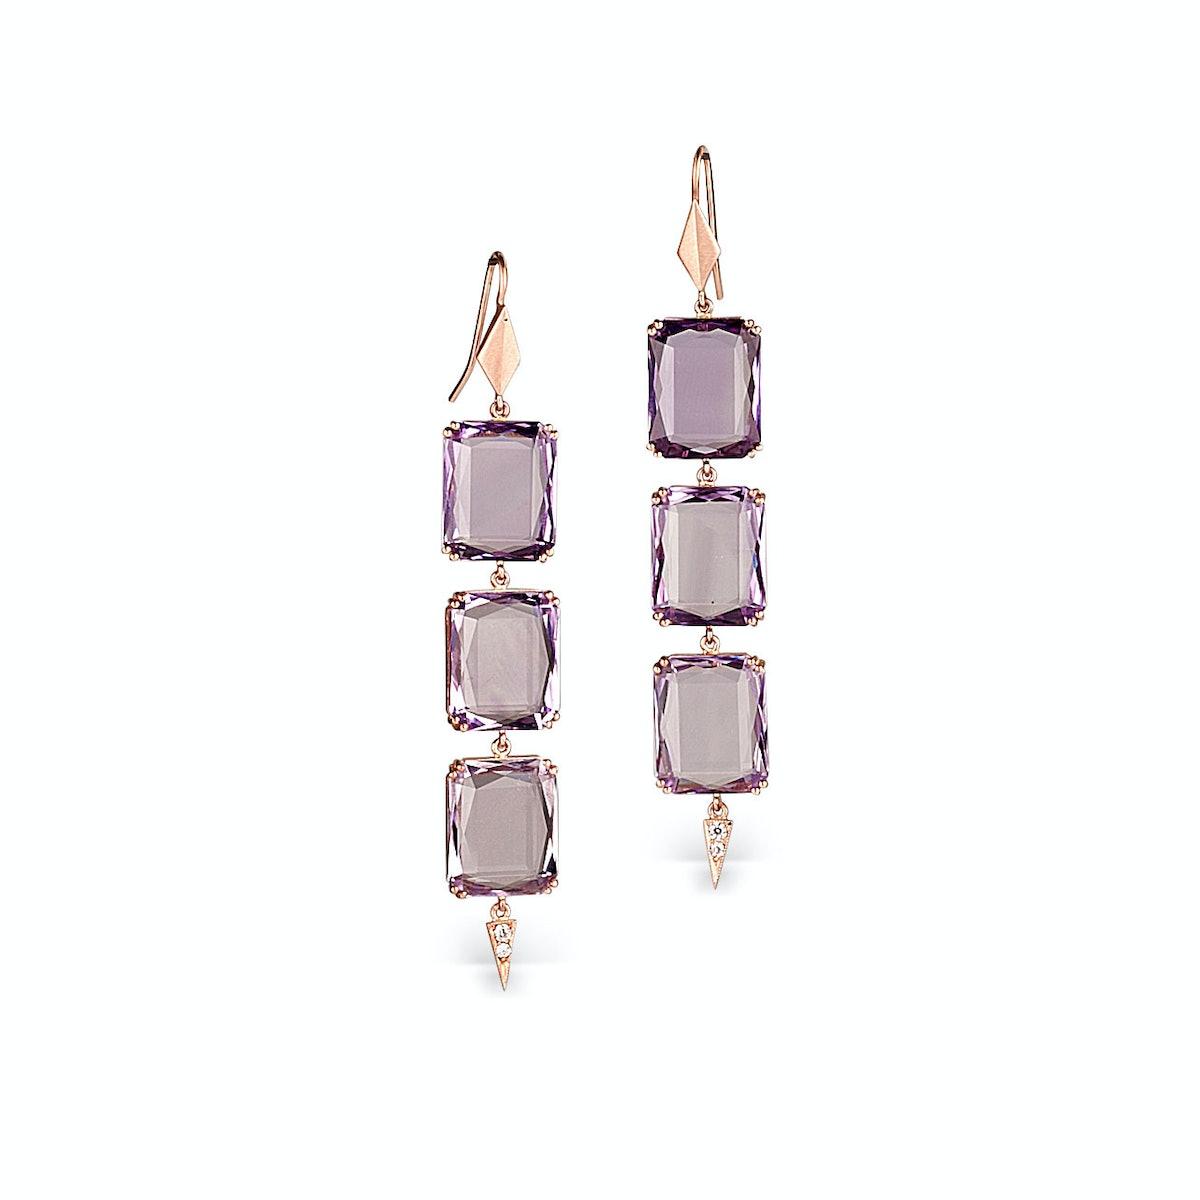 Sylva and Cie earrings